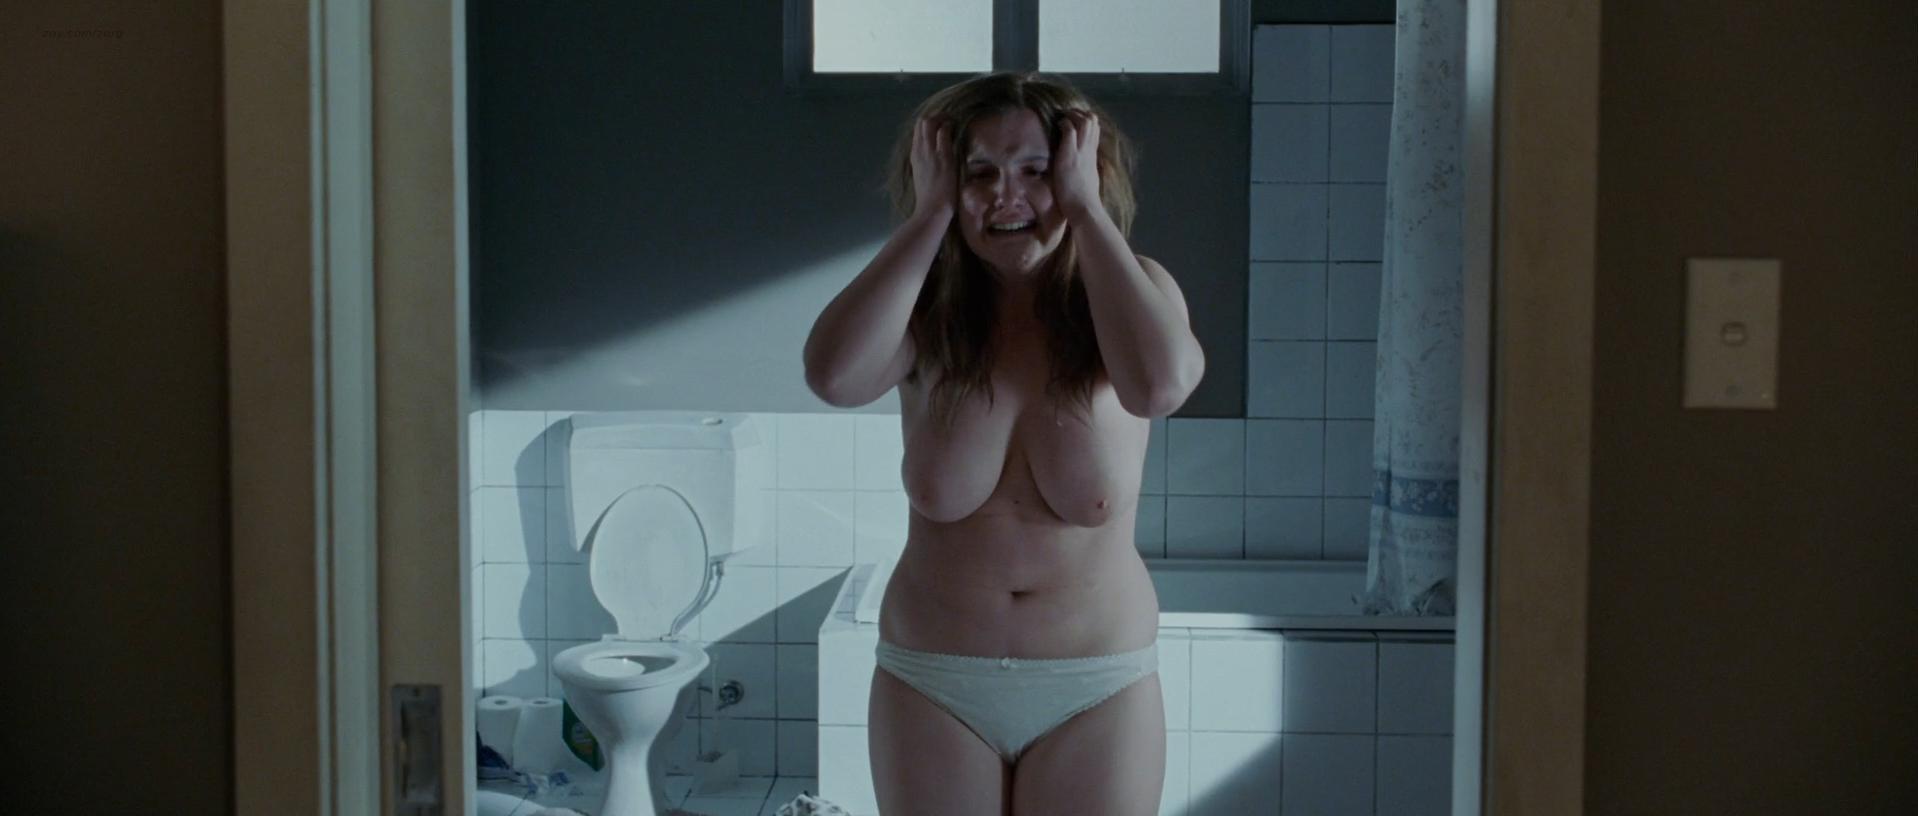 Celebrity alonna shaw sex scene with jean claude van damme - 2 7